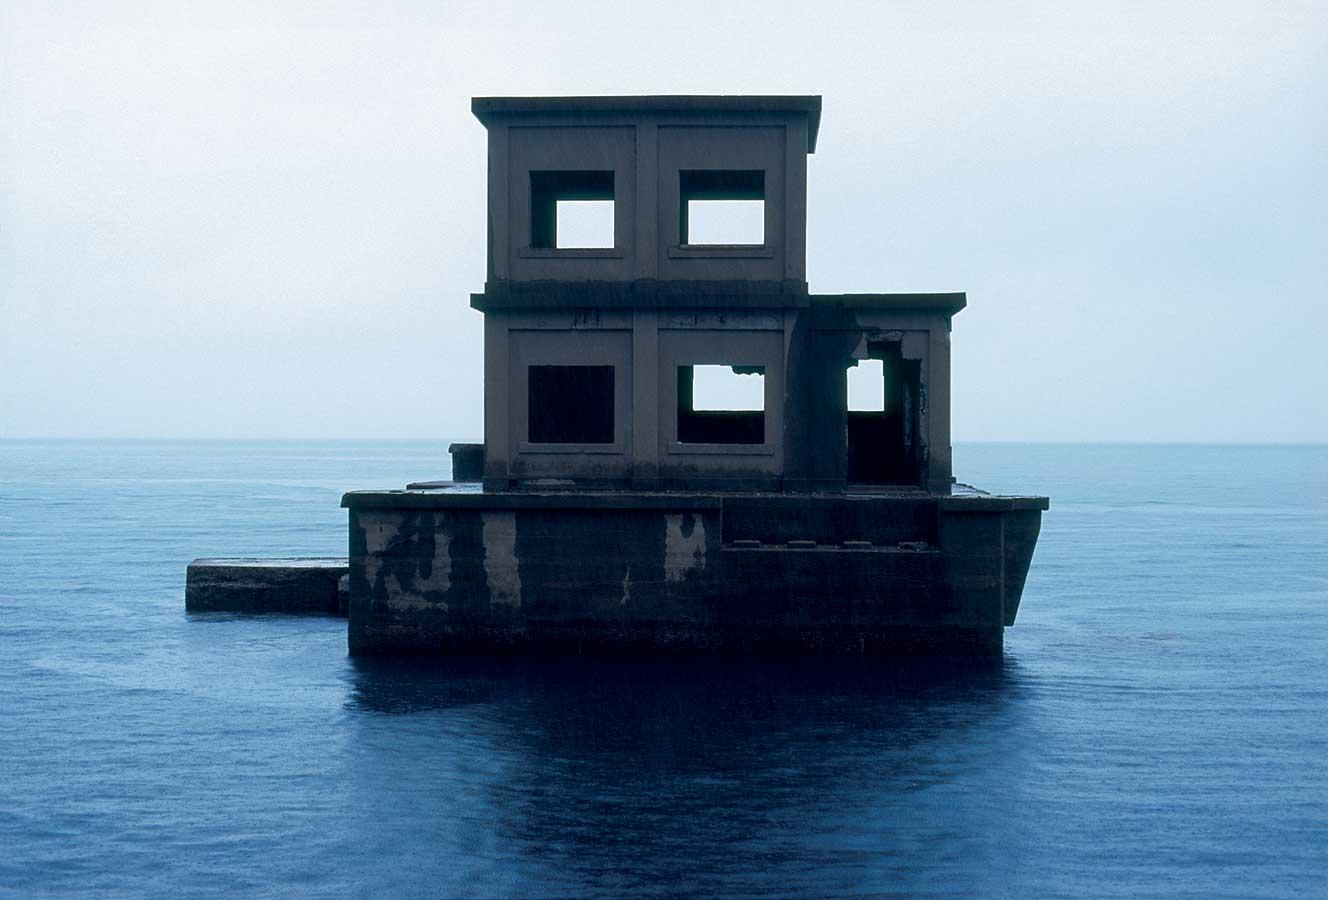 Louidgi Beltrame, Katashima torpedo base, 2011_cadre_web